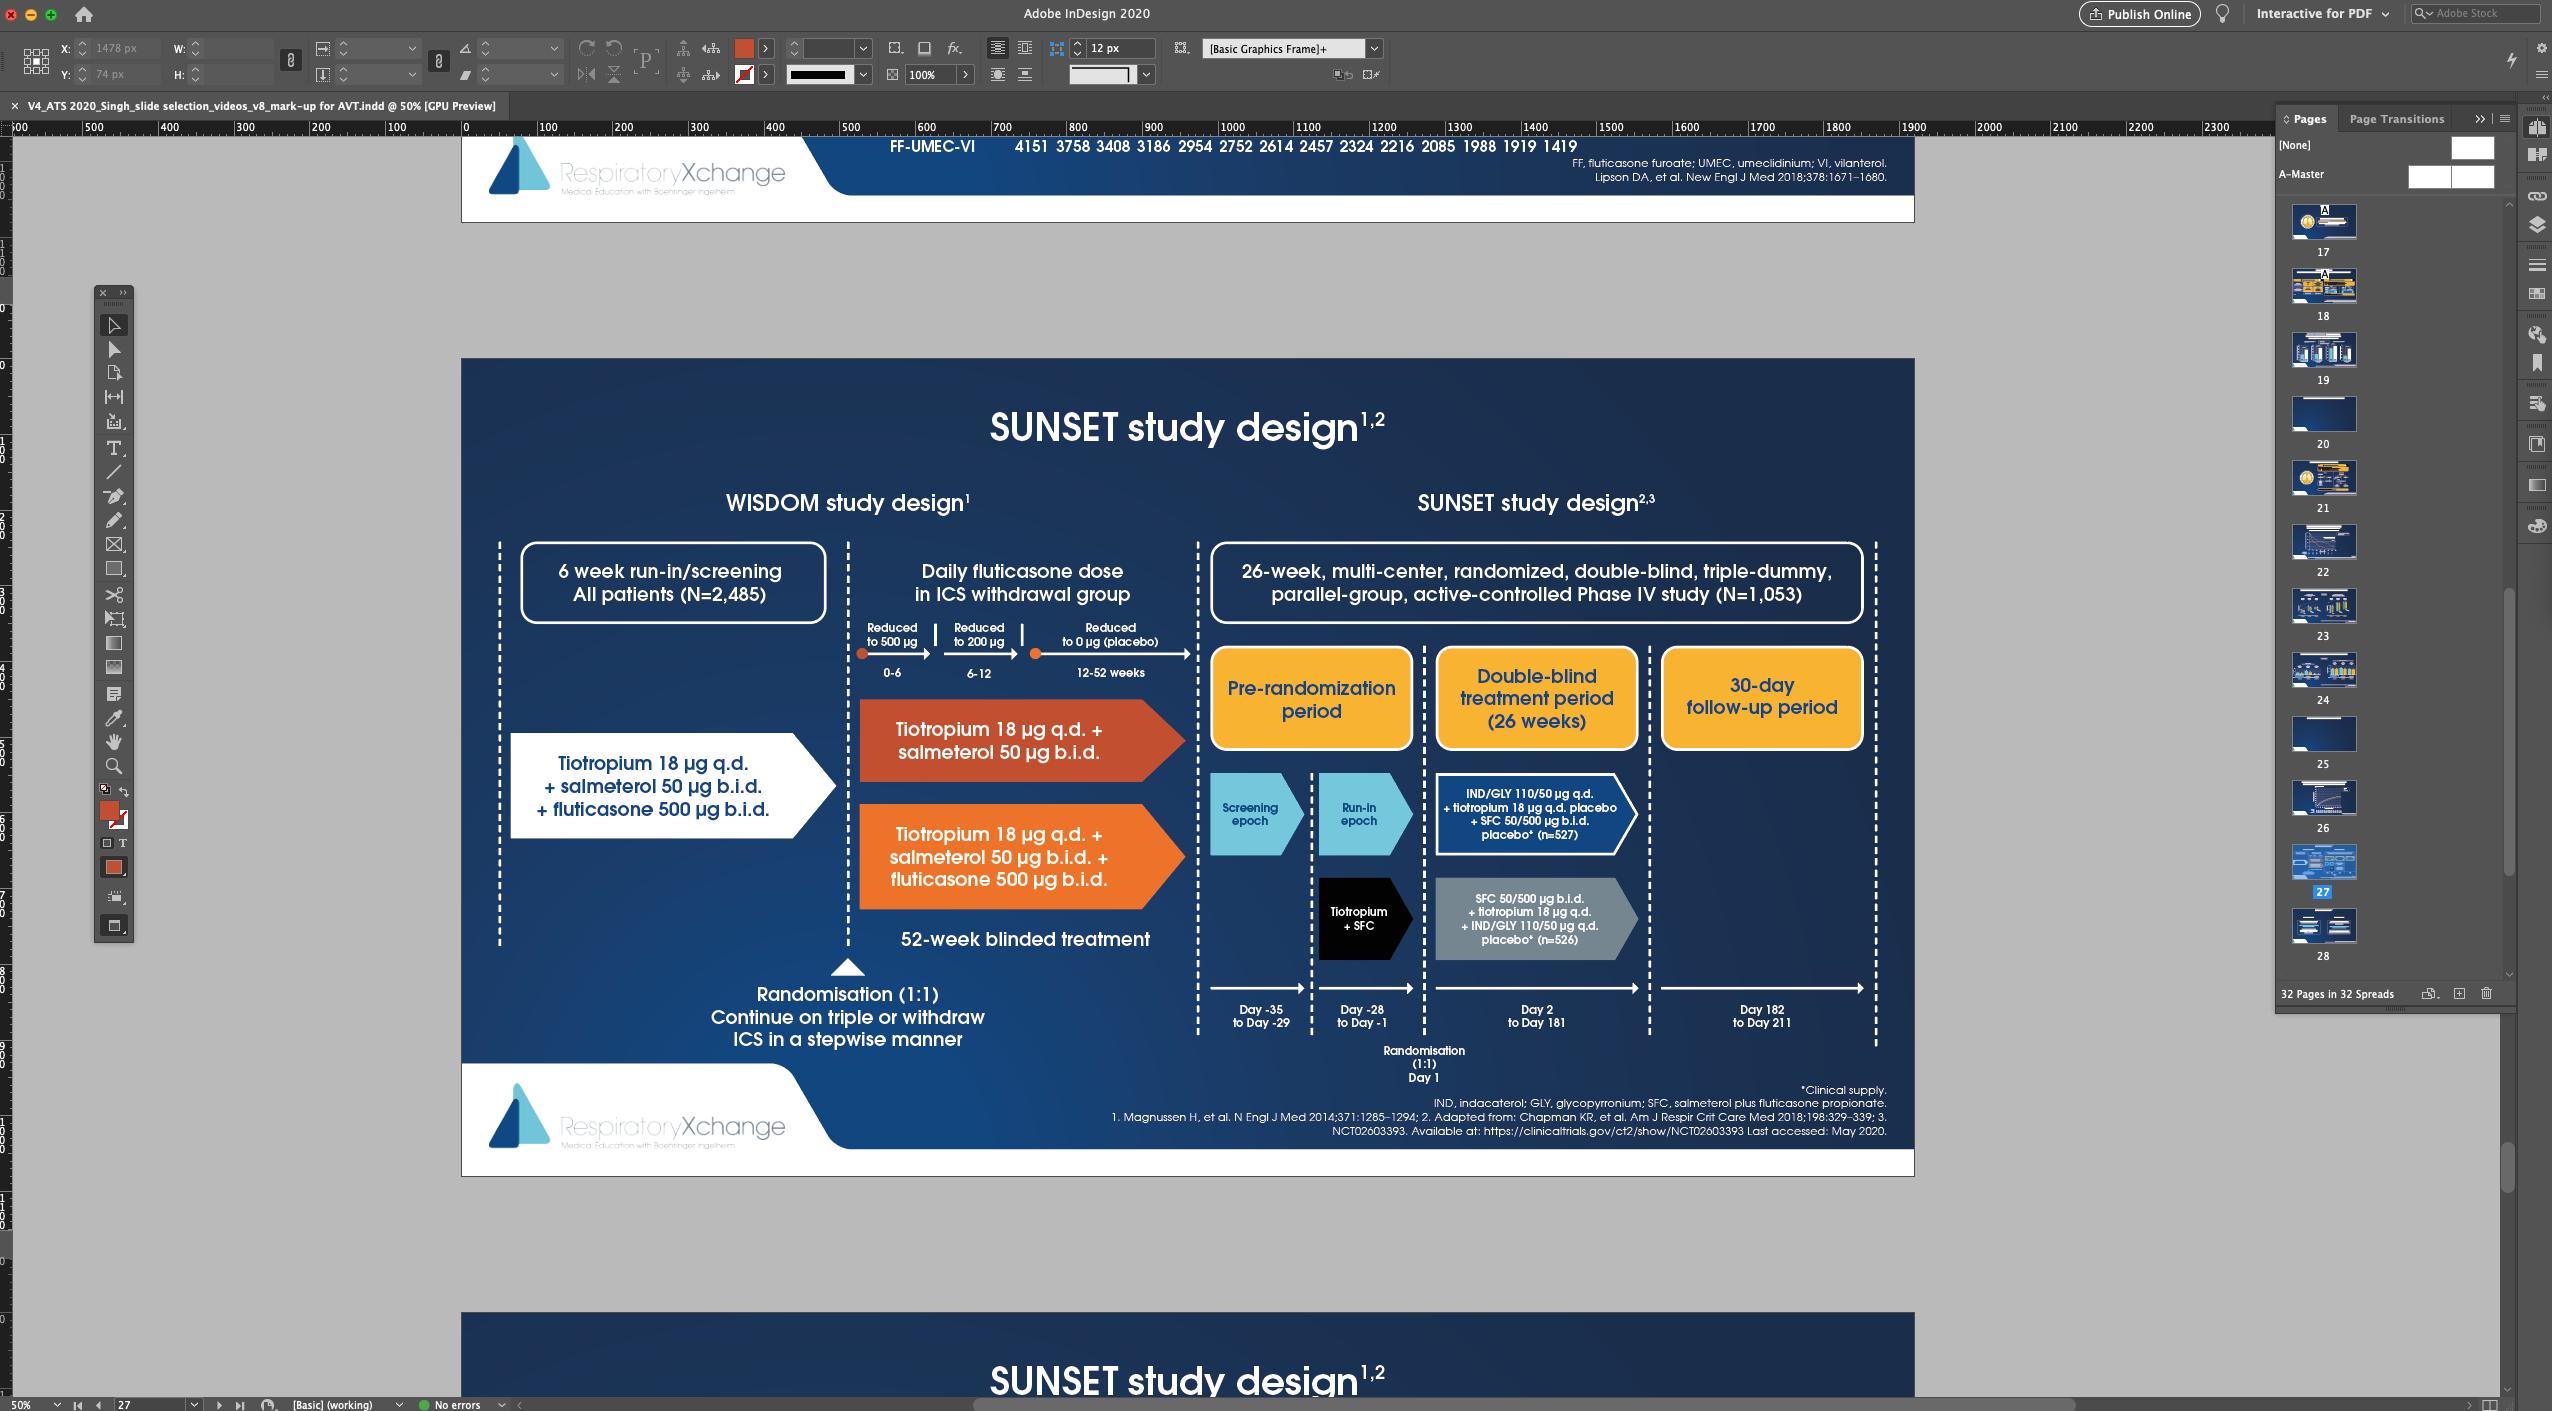 Screen shot from Adobe InDesign of a presentation slide